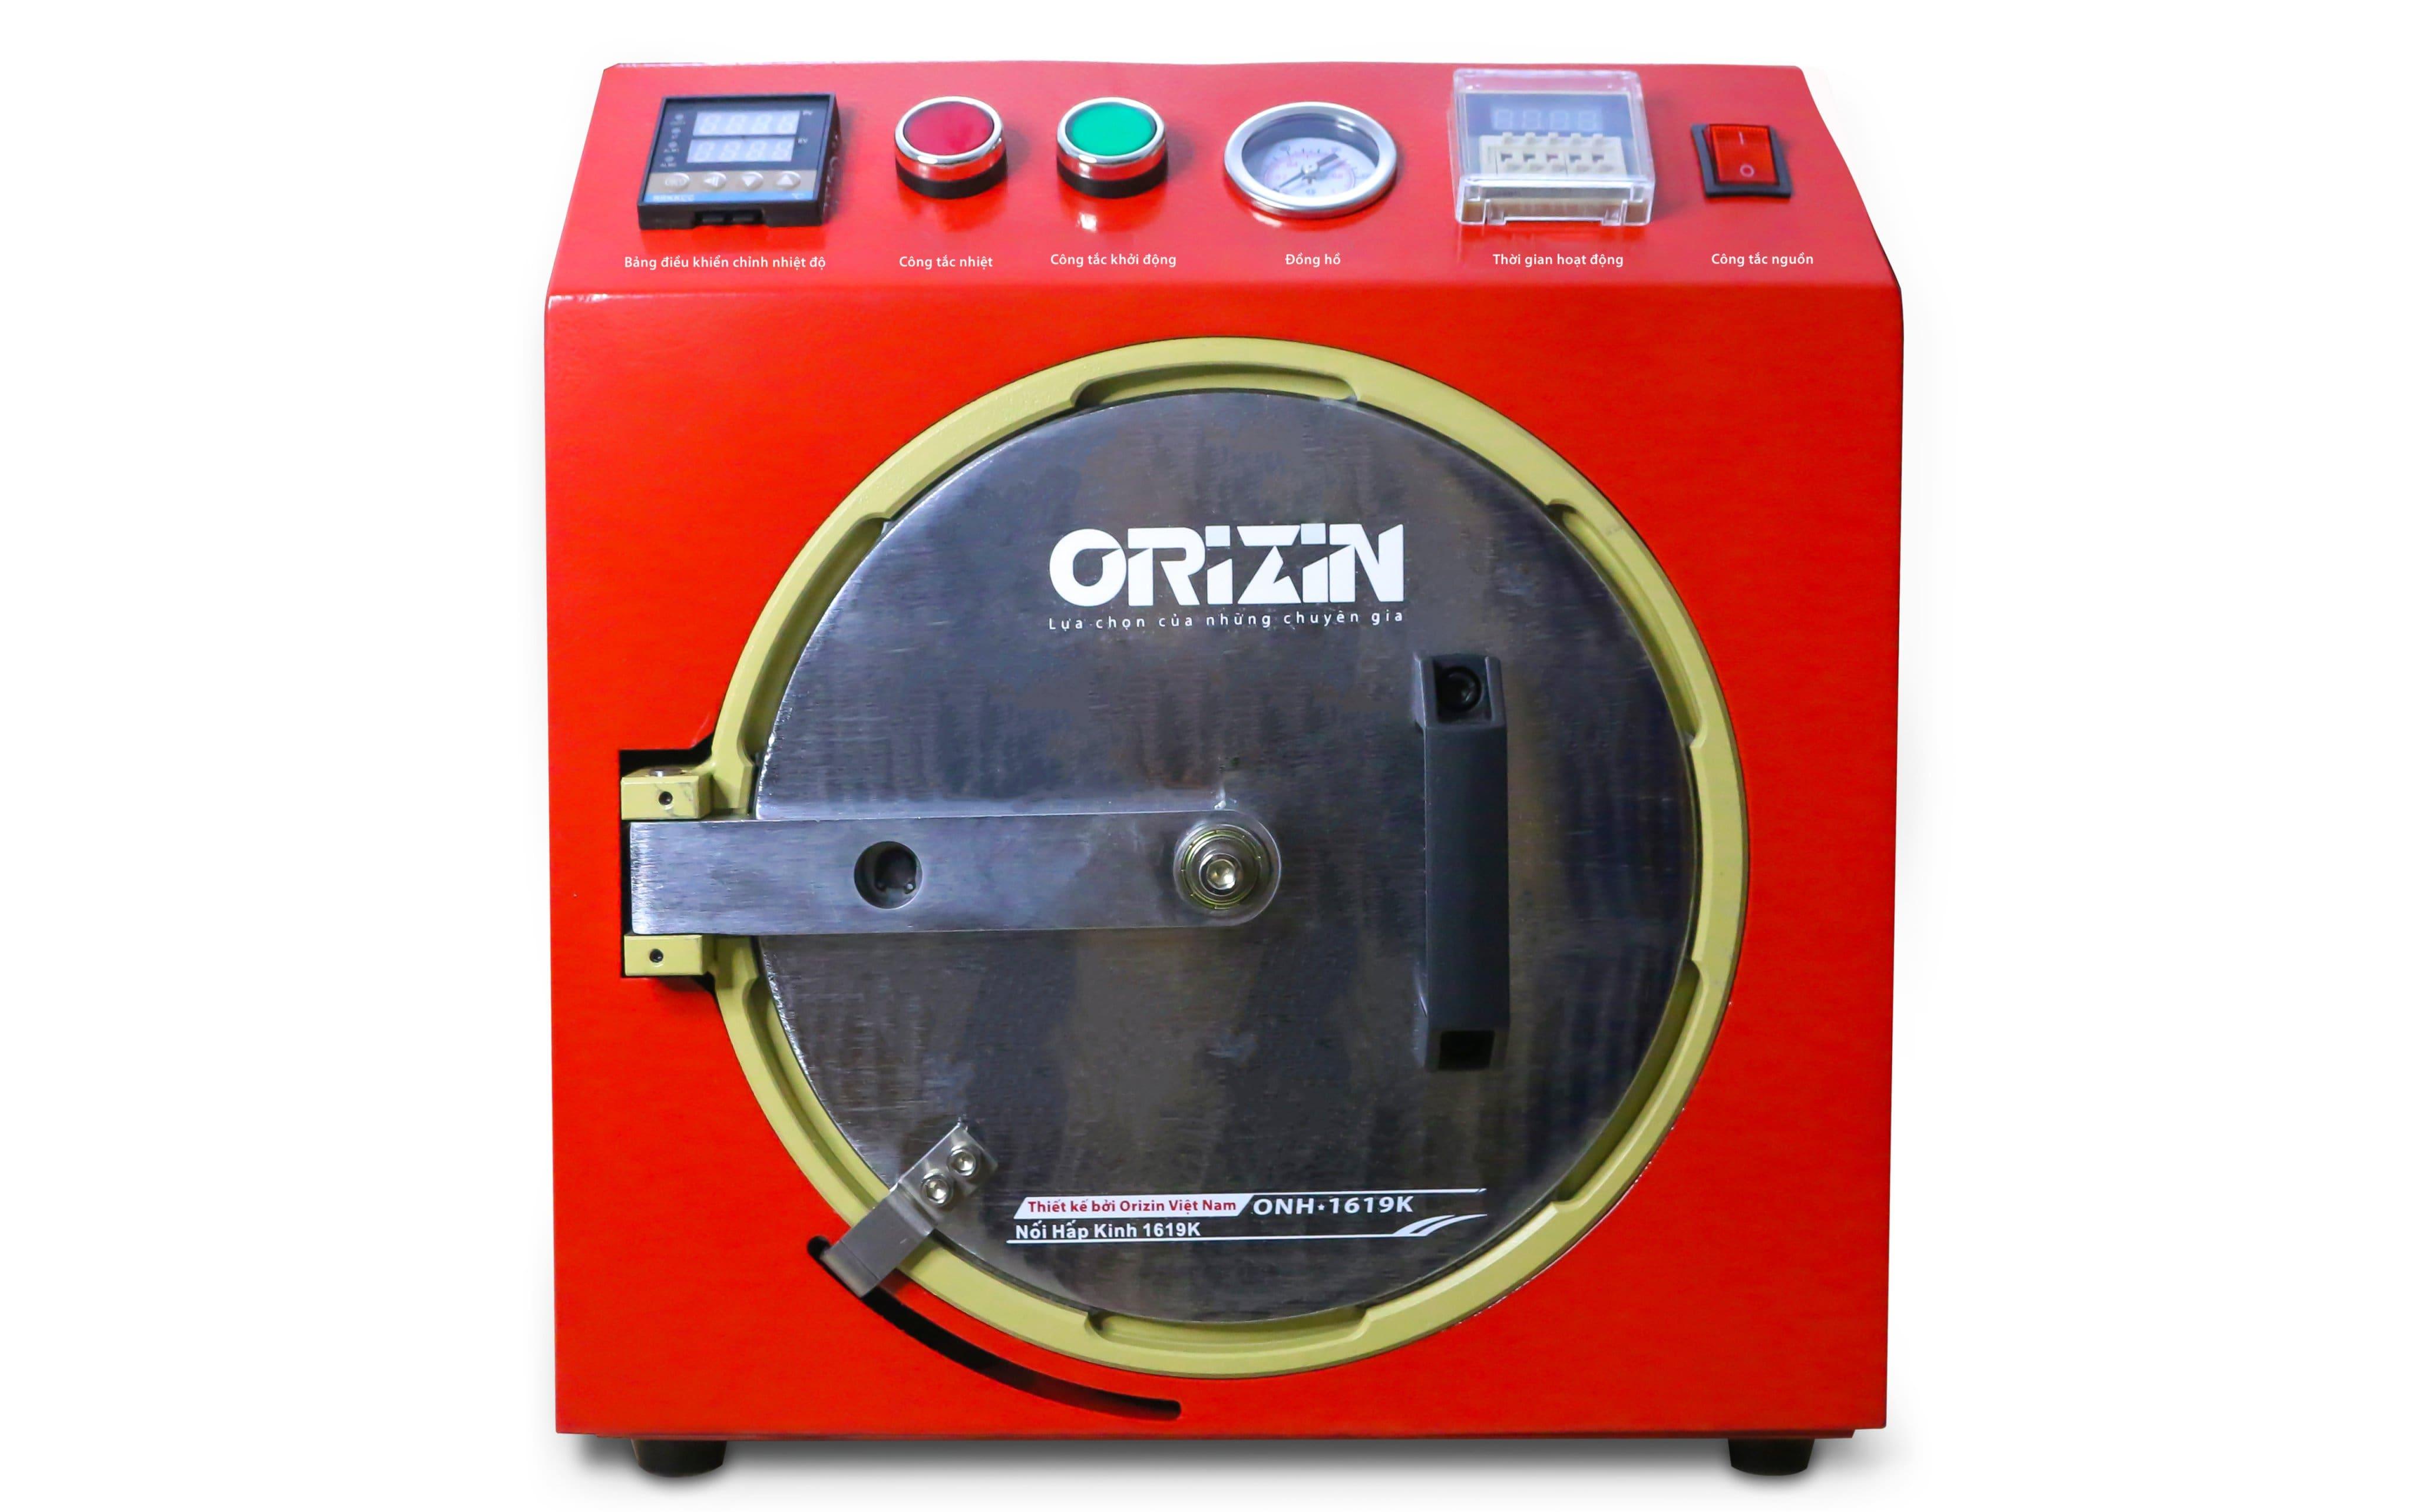 Nồi hấp kính orizin ONH - 1619k